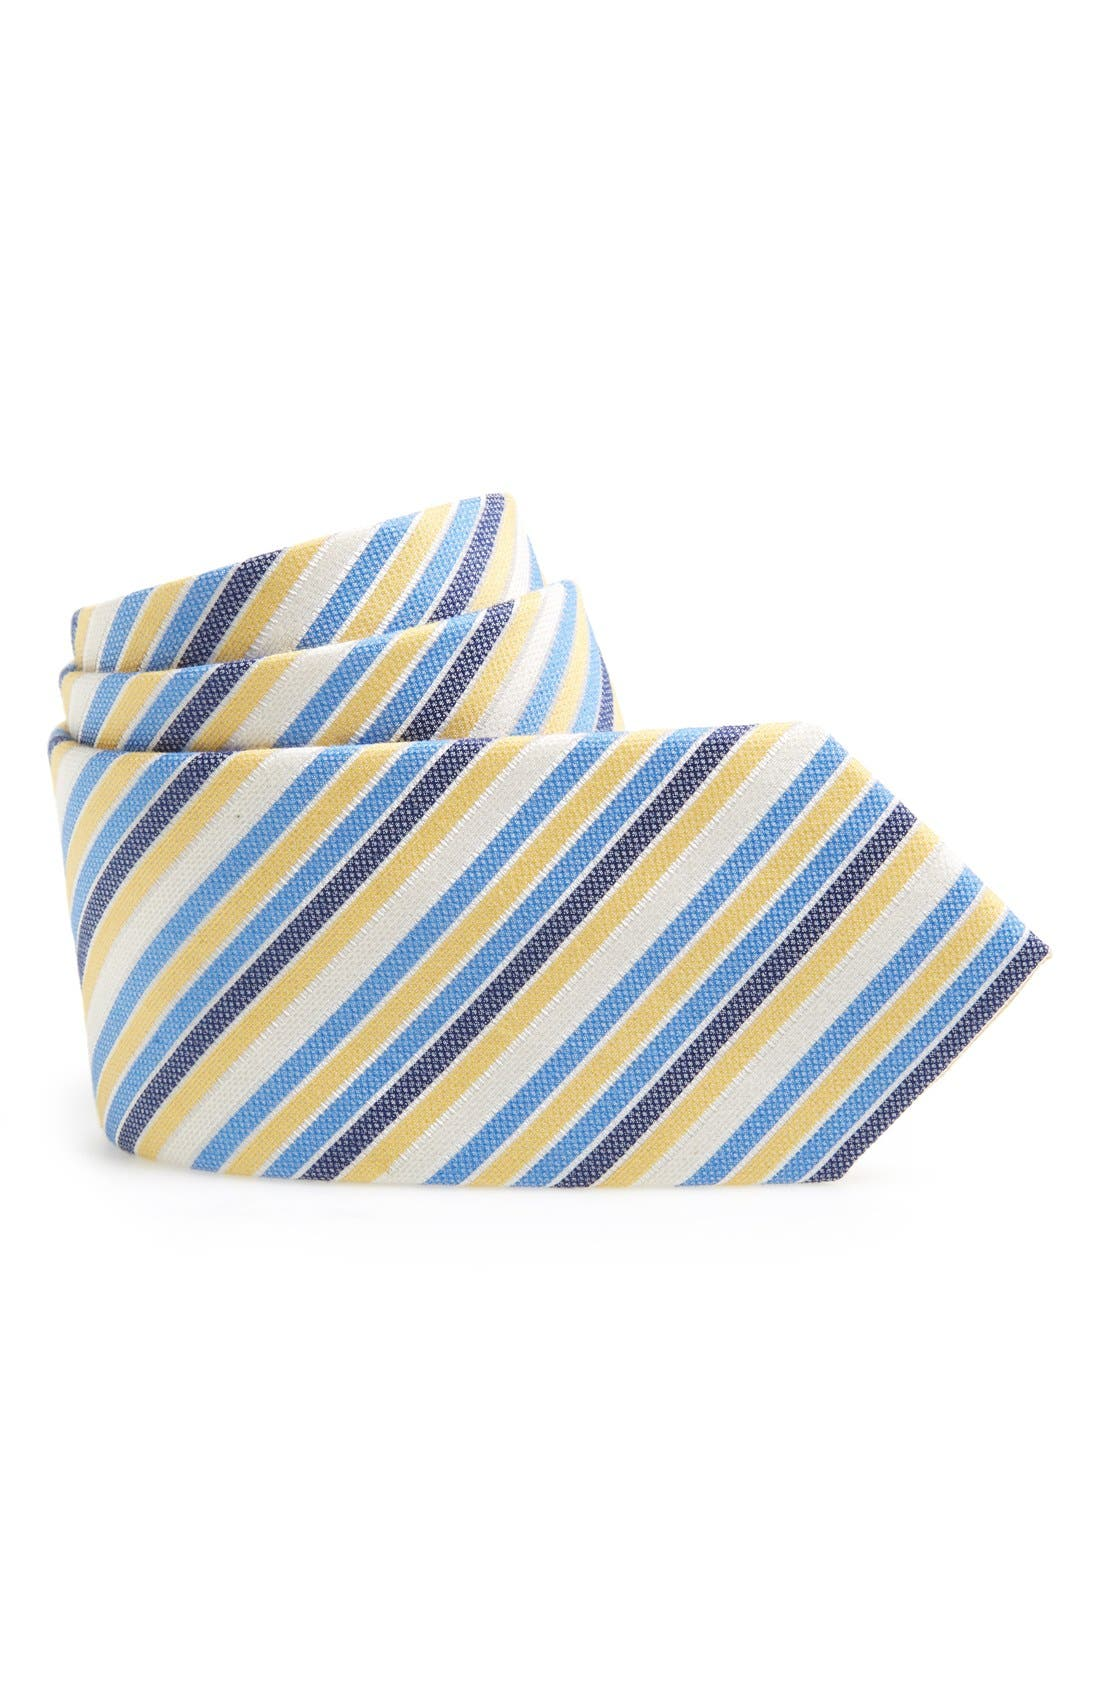 Alternate Image 1 Selected - Nordstrom Cotton & Silk Tie (Big Boys)